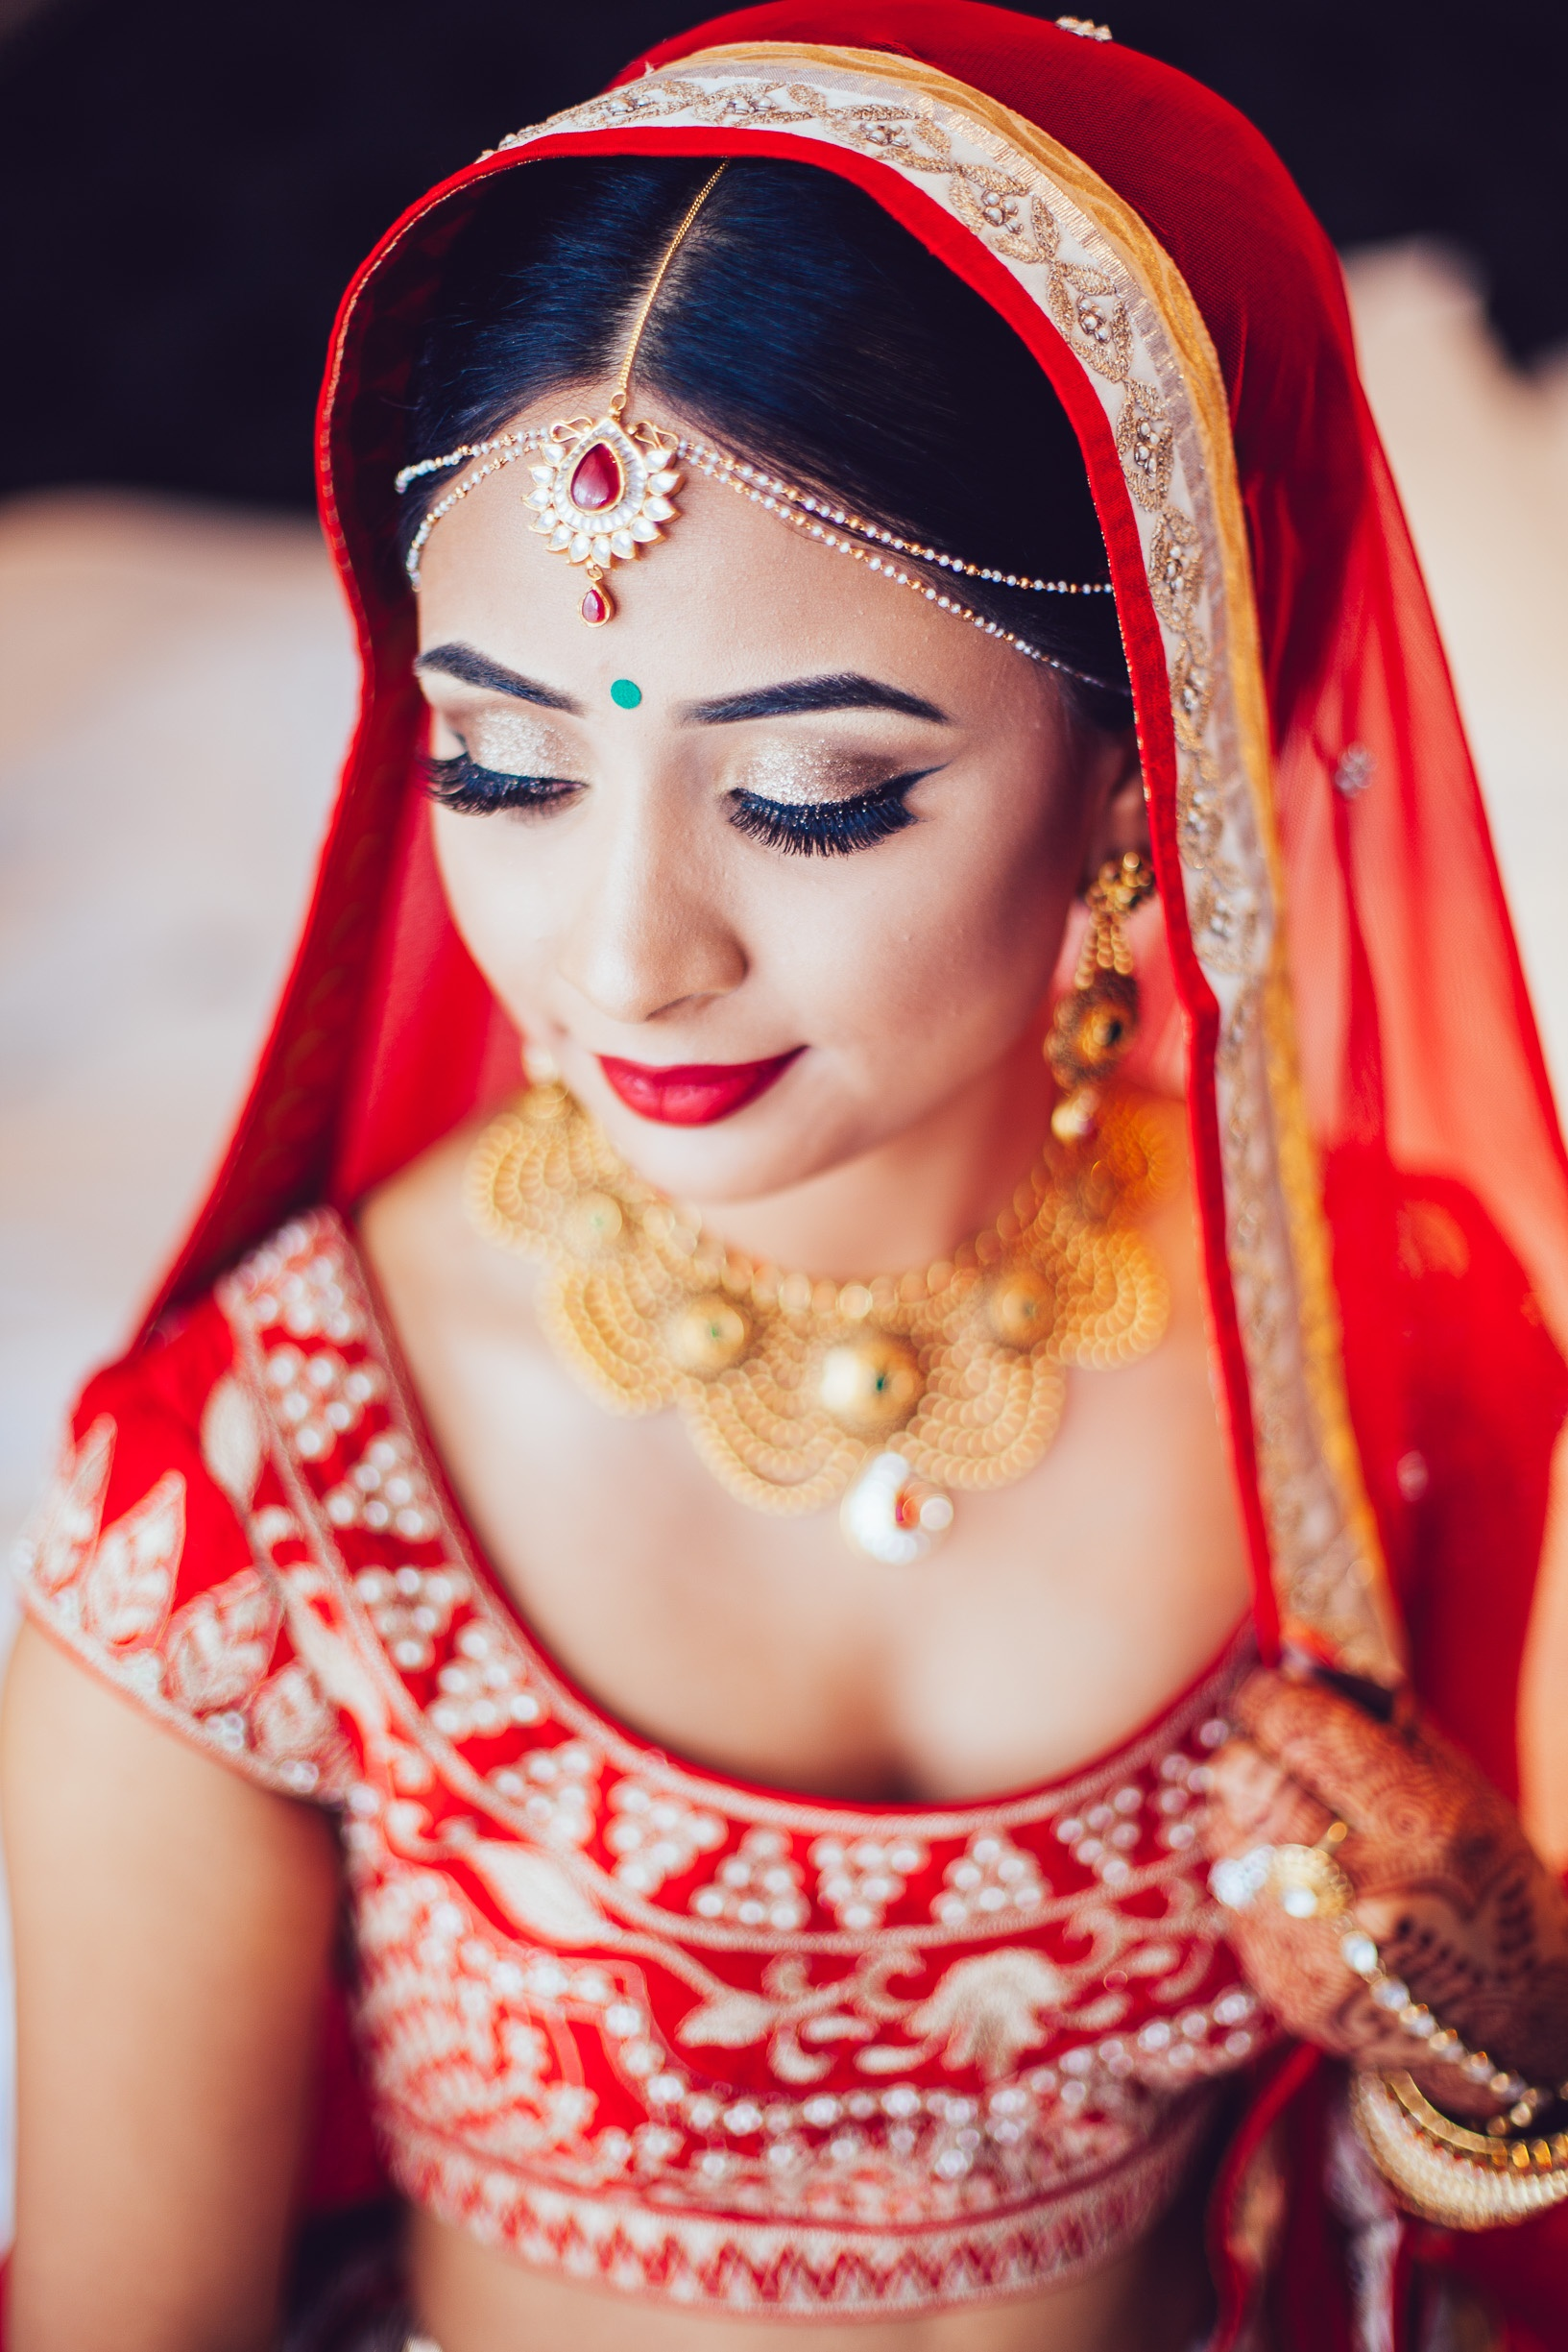 amit&ceema_eden_moments_wedding_photography-7